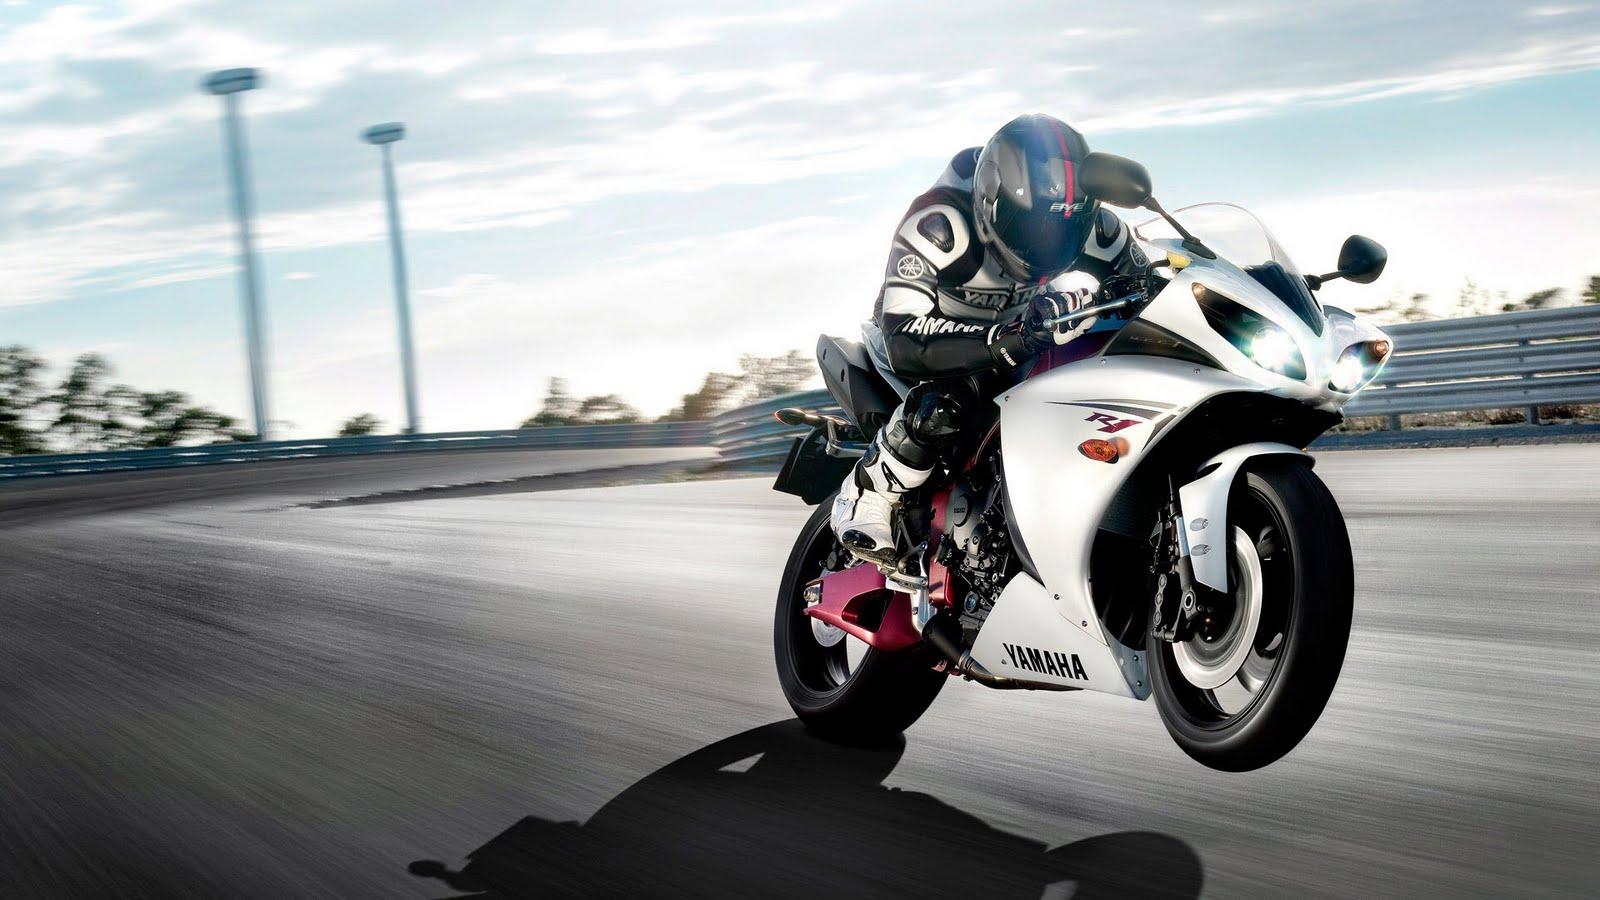 http://2.bp.blogspot.com/-3iFn-srERDI/TafRBHQOZLI/AAAAAAAACmo/J0ONcxtPBCI/s1600/yamaha-r1-race-sports-bike.jpg